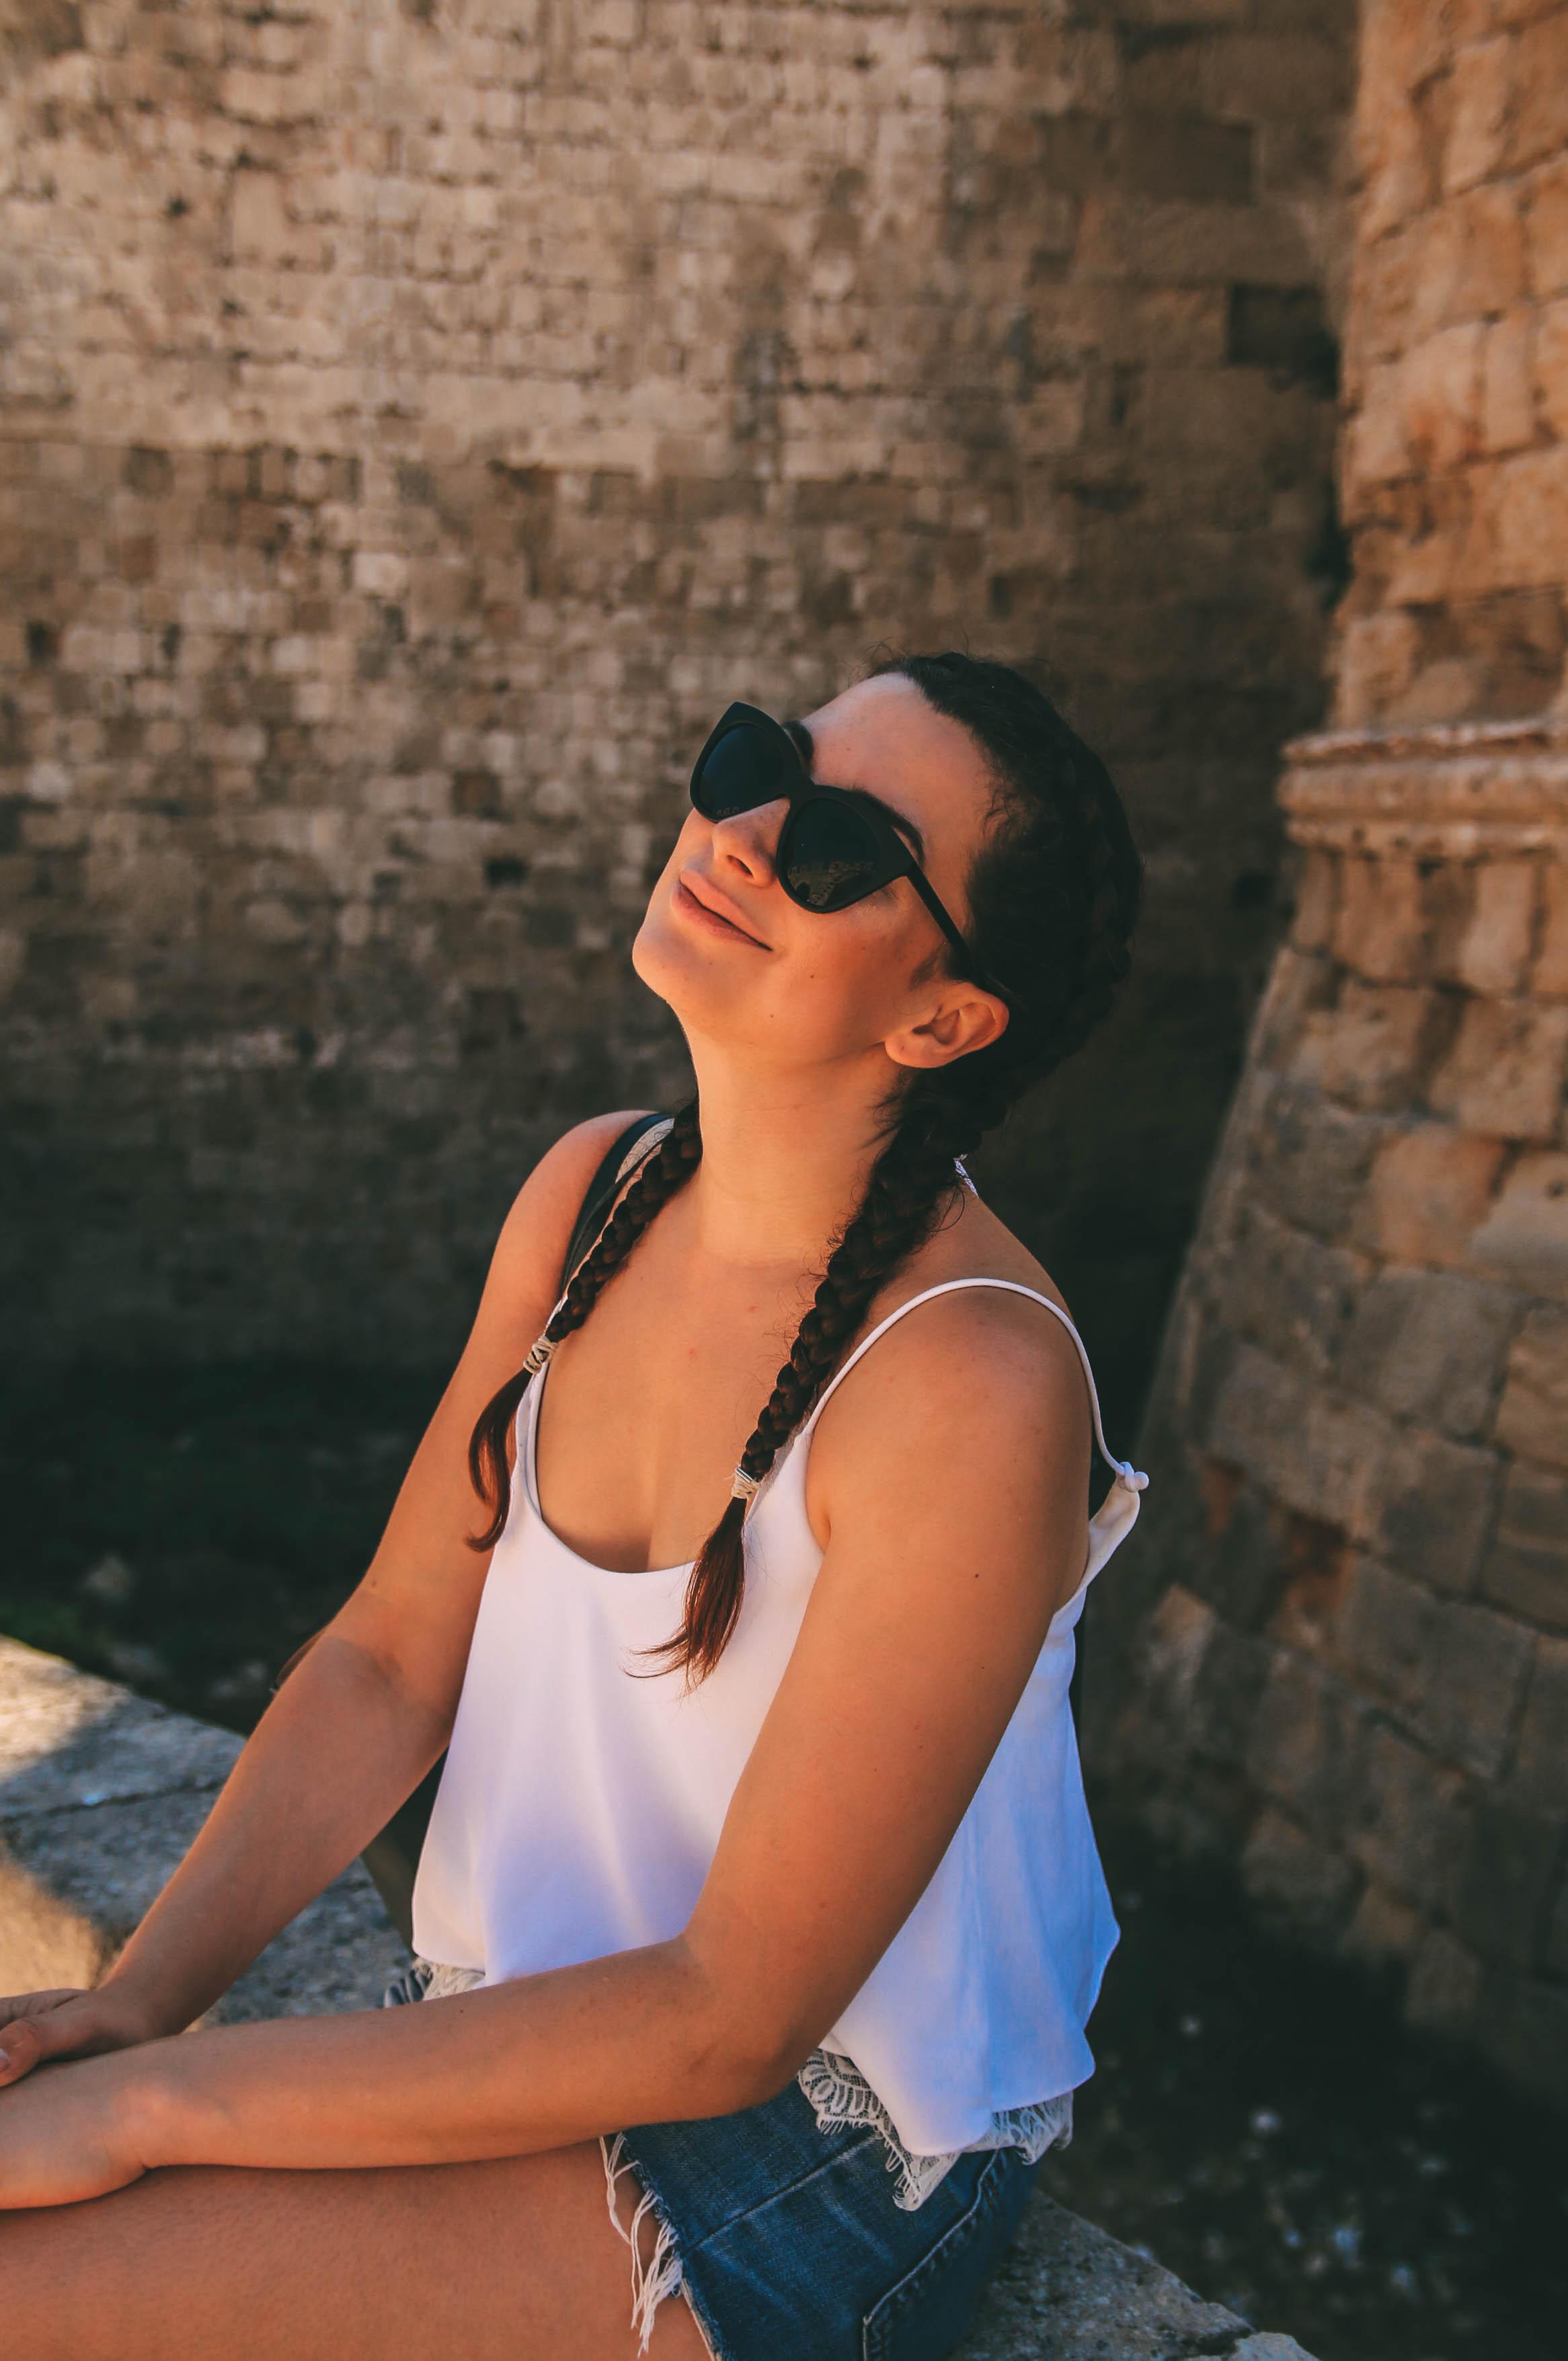 lina_mallon_rhodos_traveldiary (43 von 65)